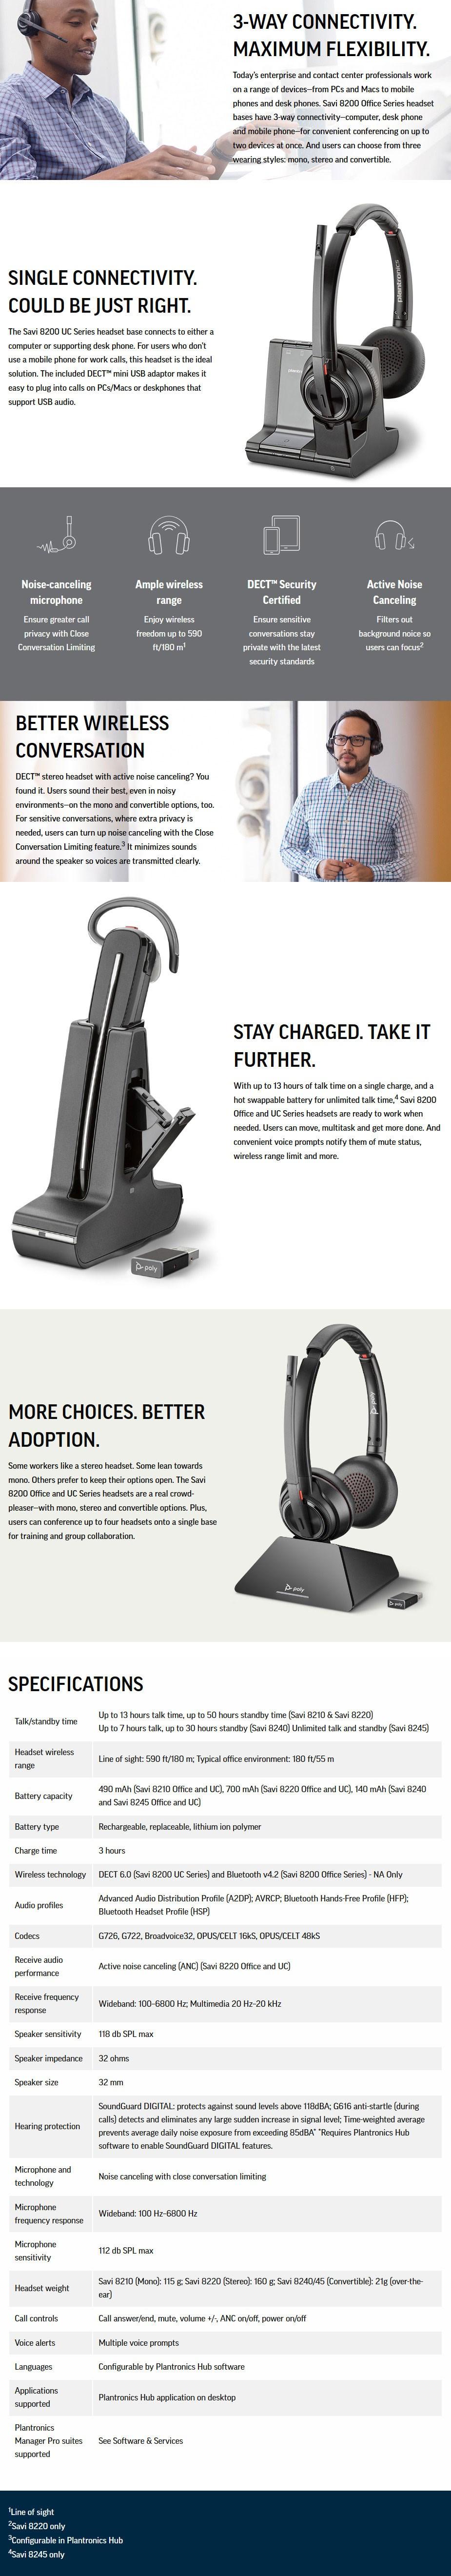 plantronics-savi-8240-uc-convertible-wireless-dect-headset-system-ac31081-1-2-.jpg